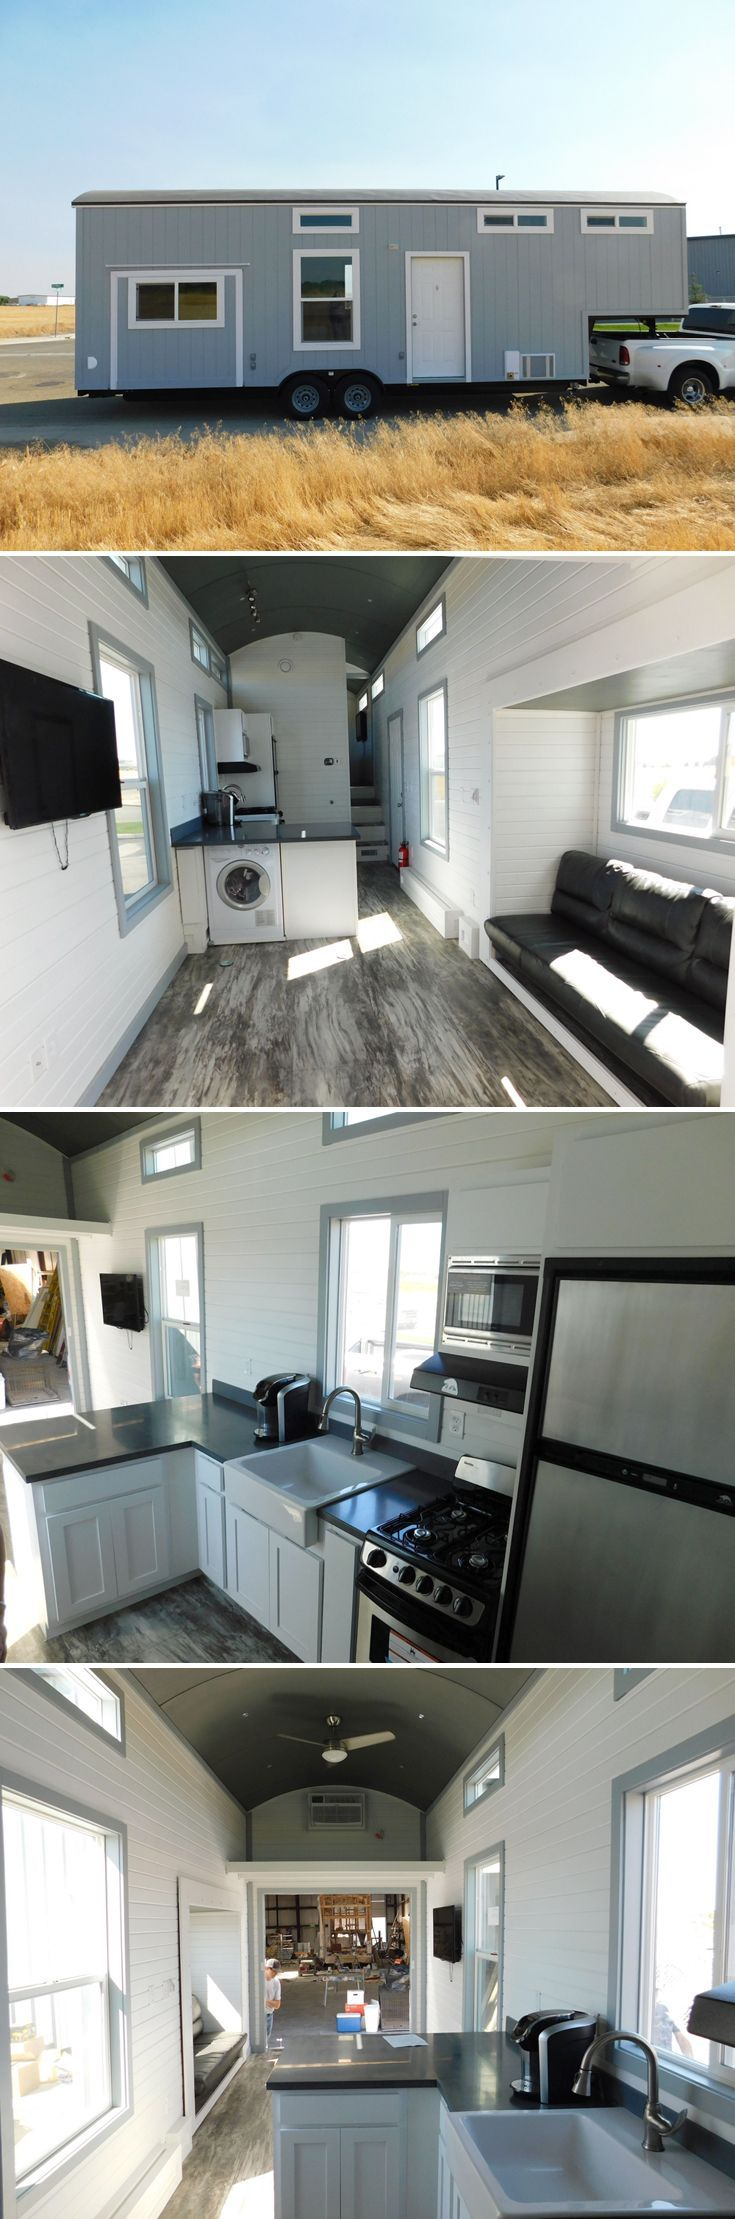 12 best Floor Patterns images on Pinterest | Apartment interior ...